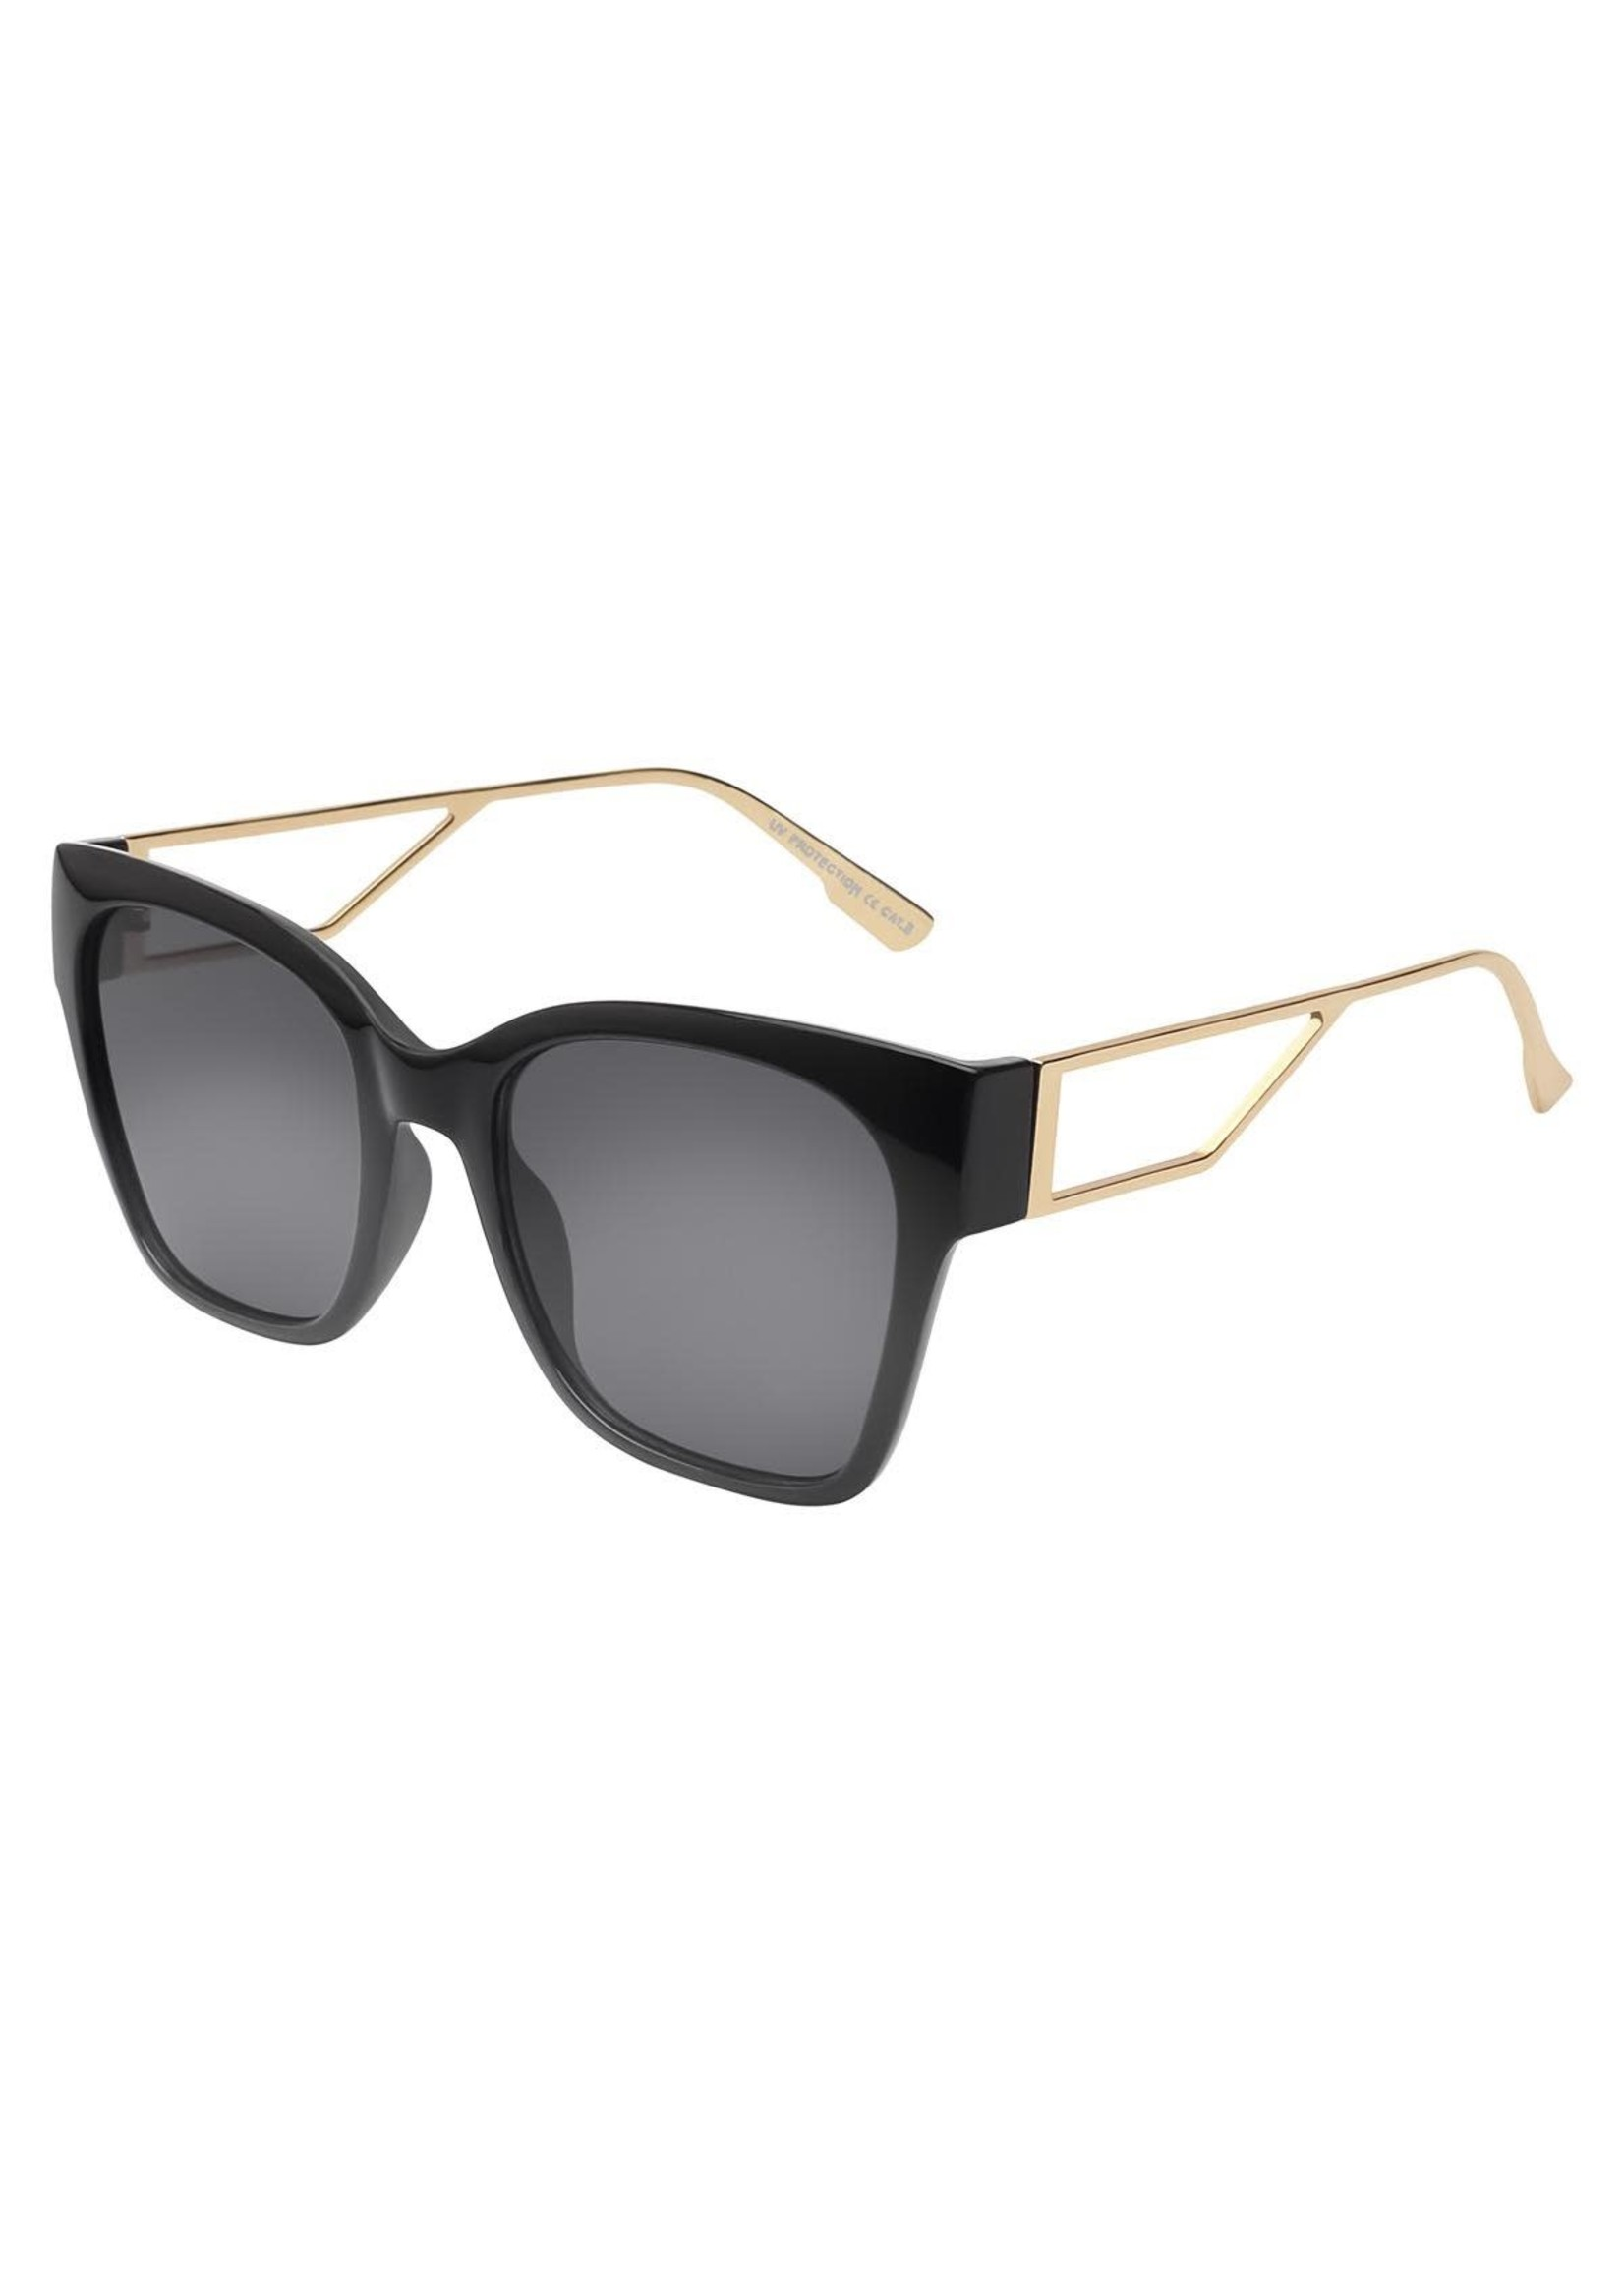 London Sunglasses Black